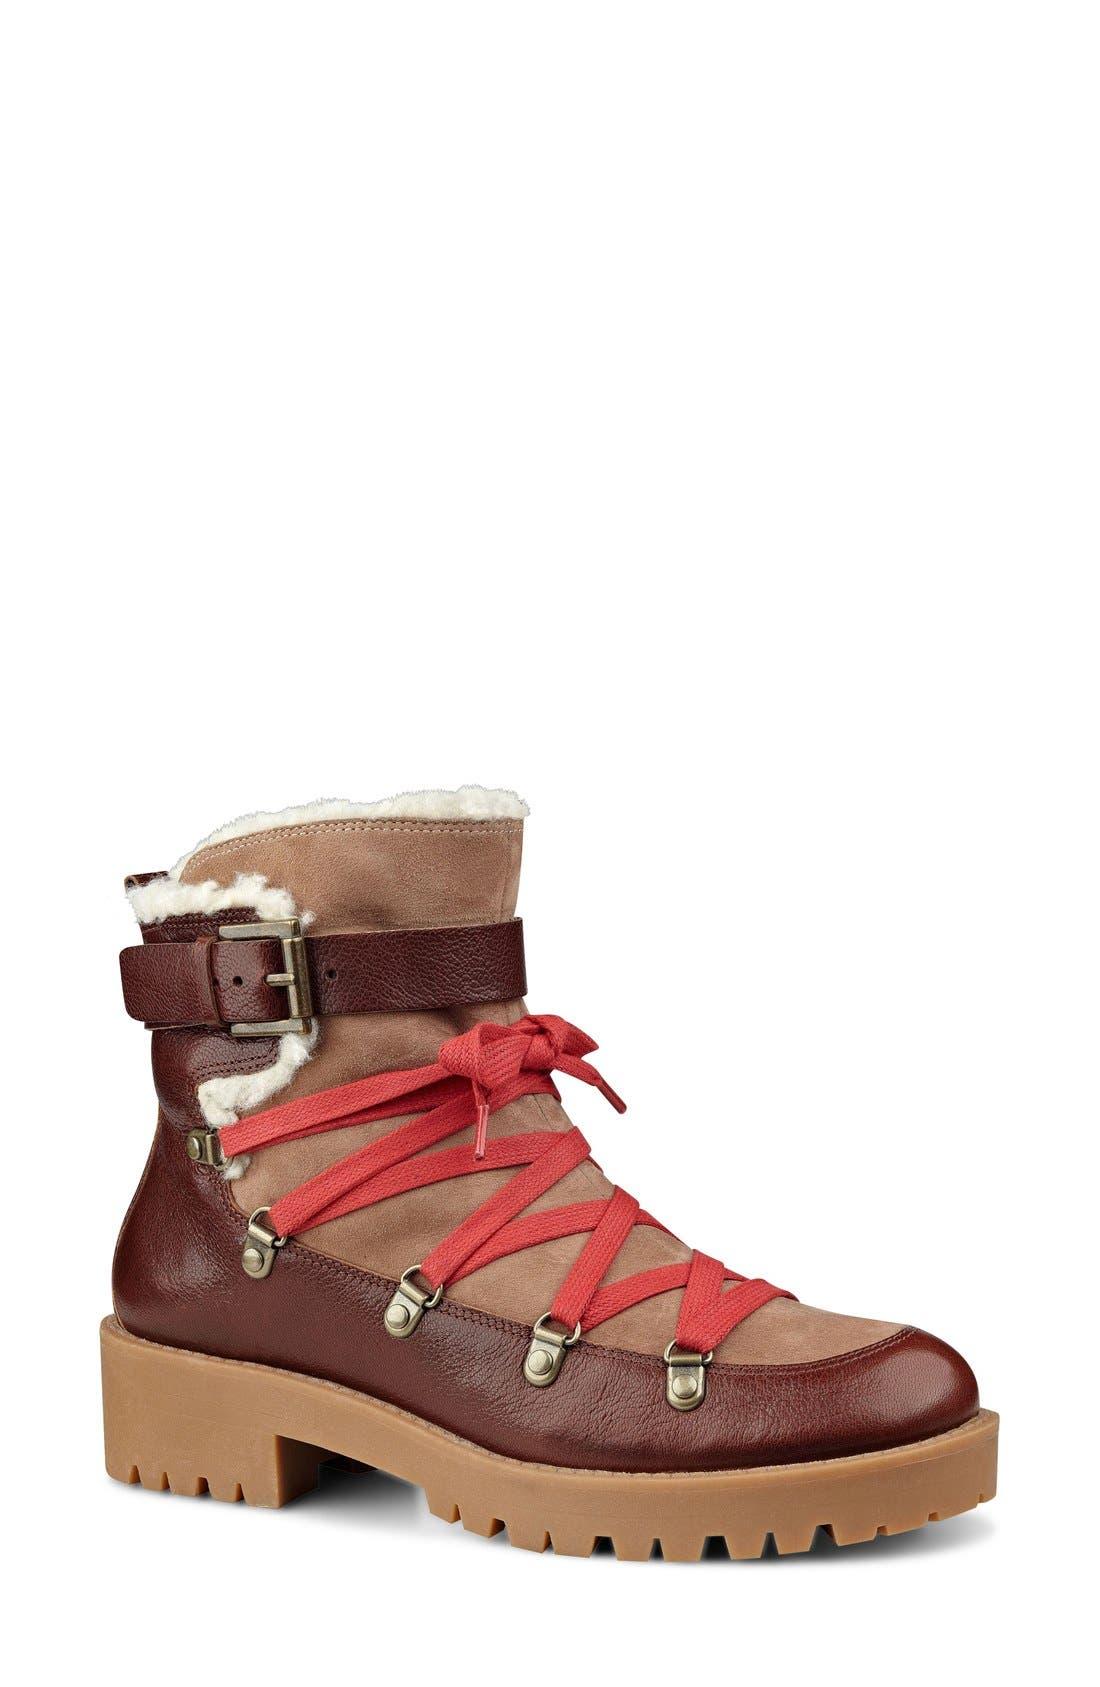 Main Image - Nine West 'Orynne' Hiker Boot (Women)